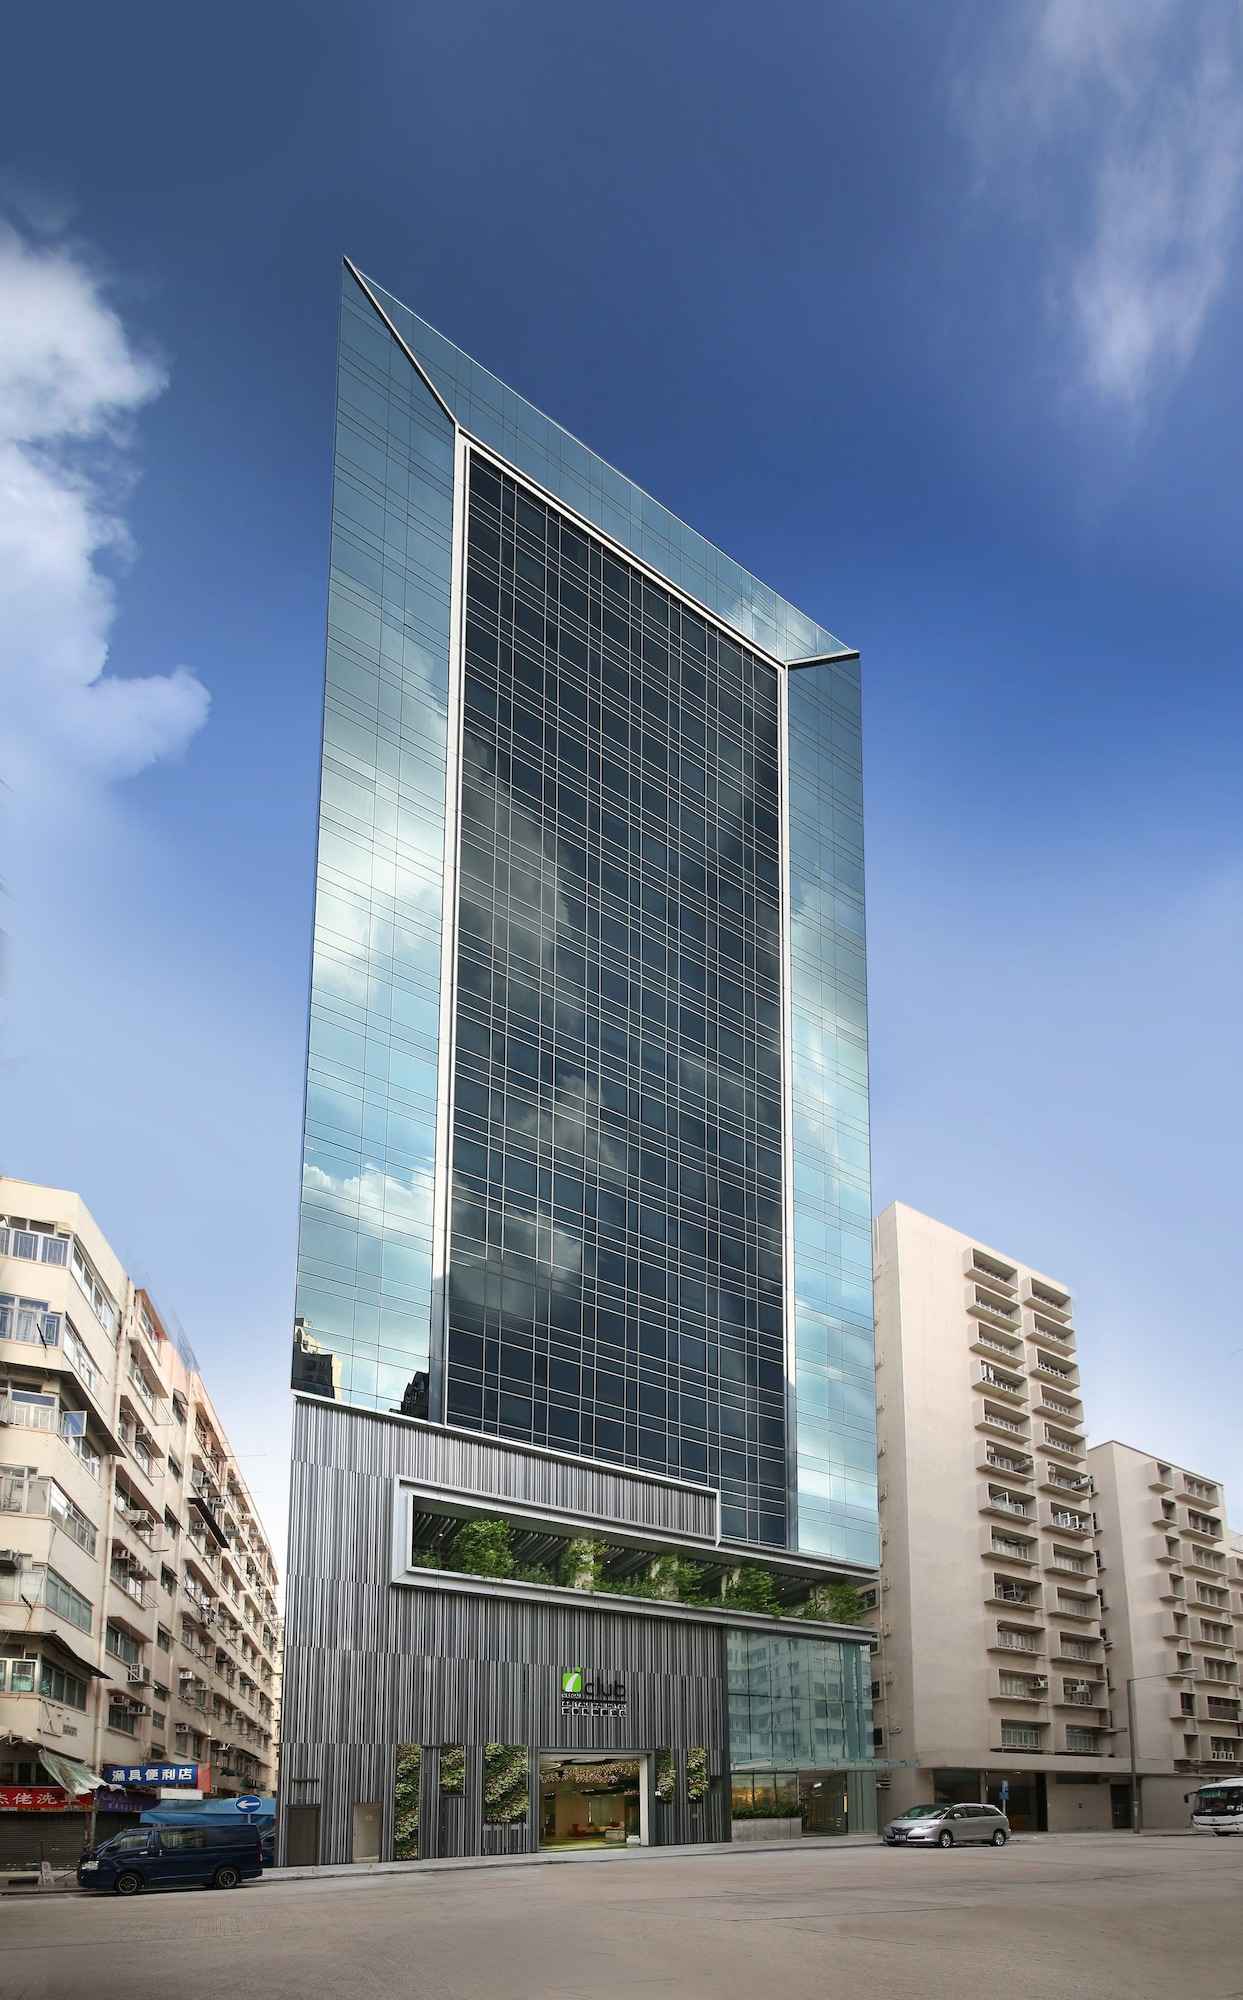 iclub Ma Tau Wai Hotel, Kowloon City